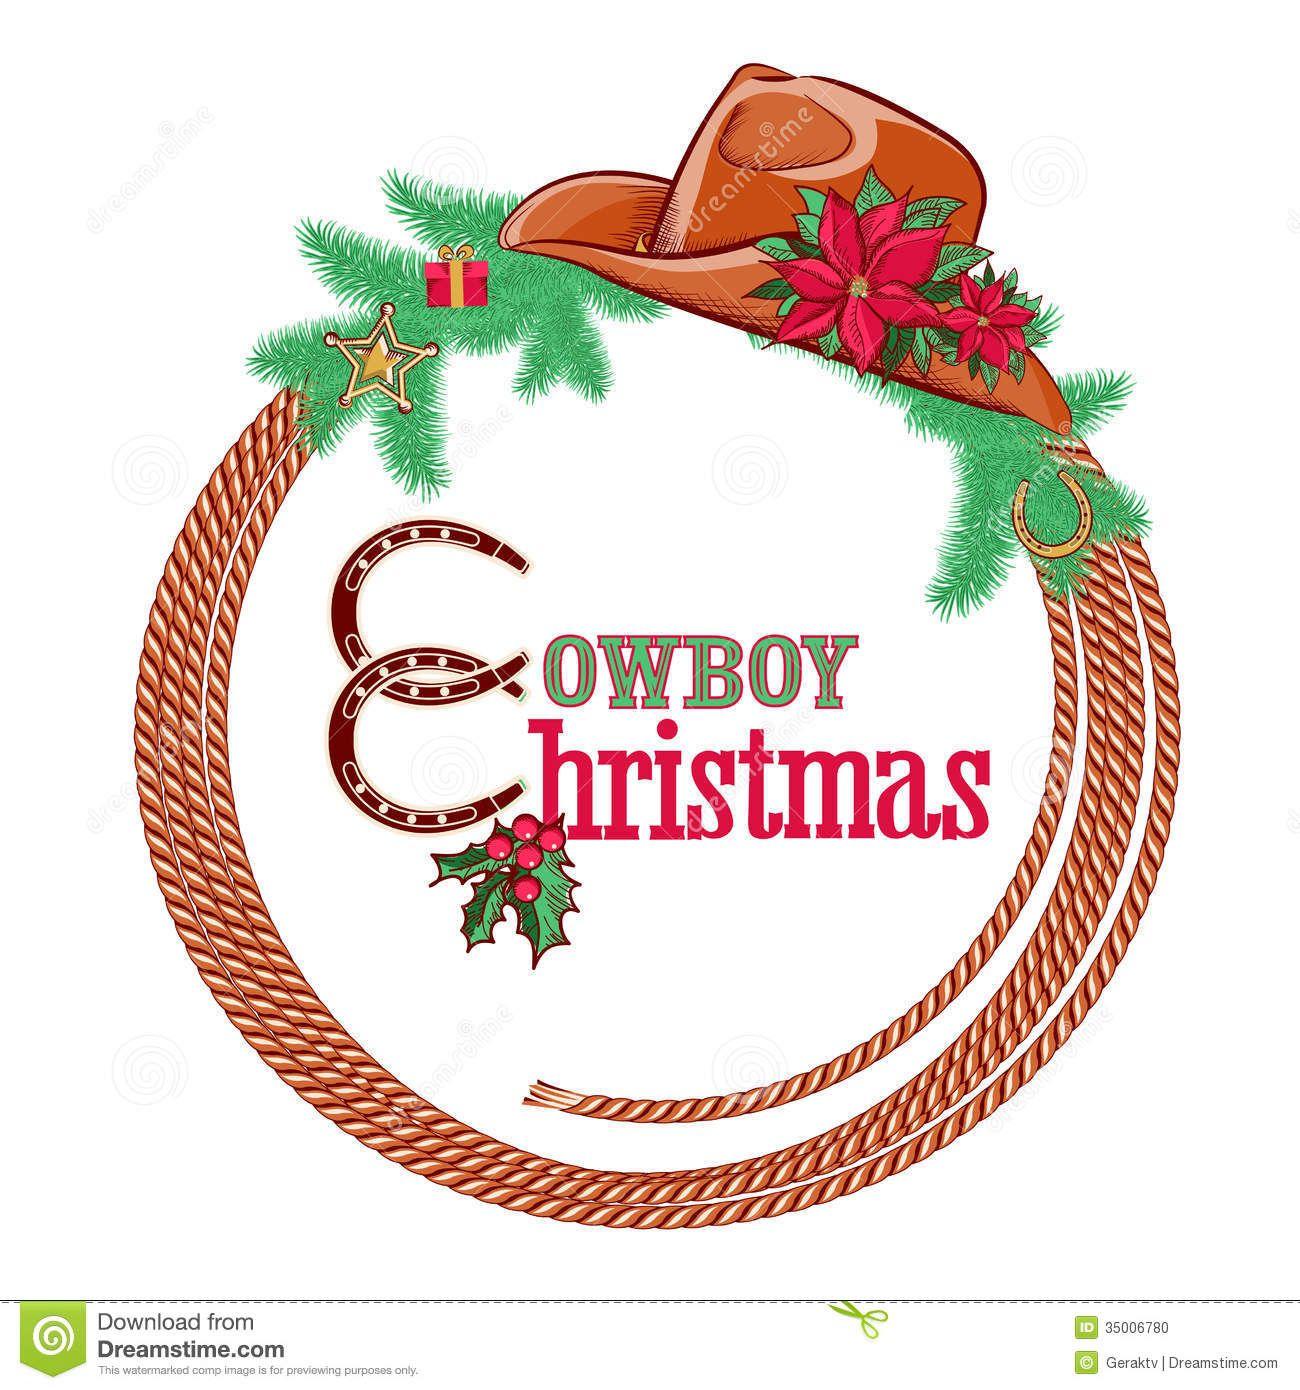 Cowboy Christmas Decor: Free Christmas Free Clip Art Western Theme Cowboy